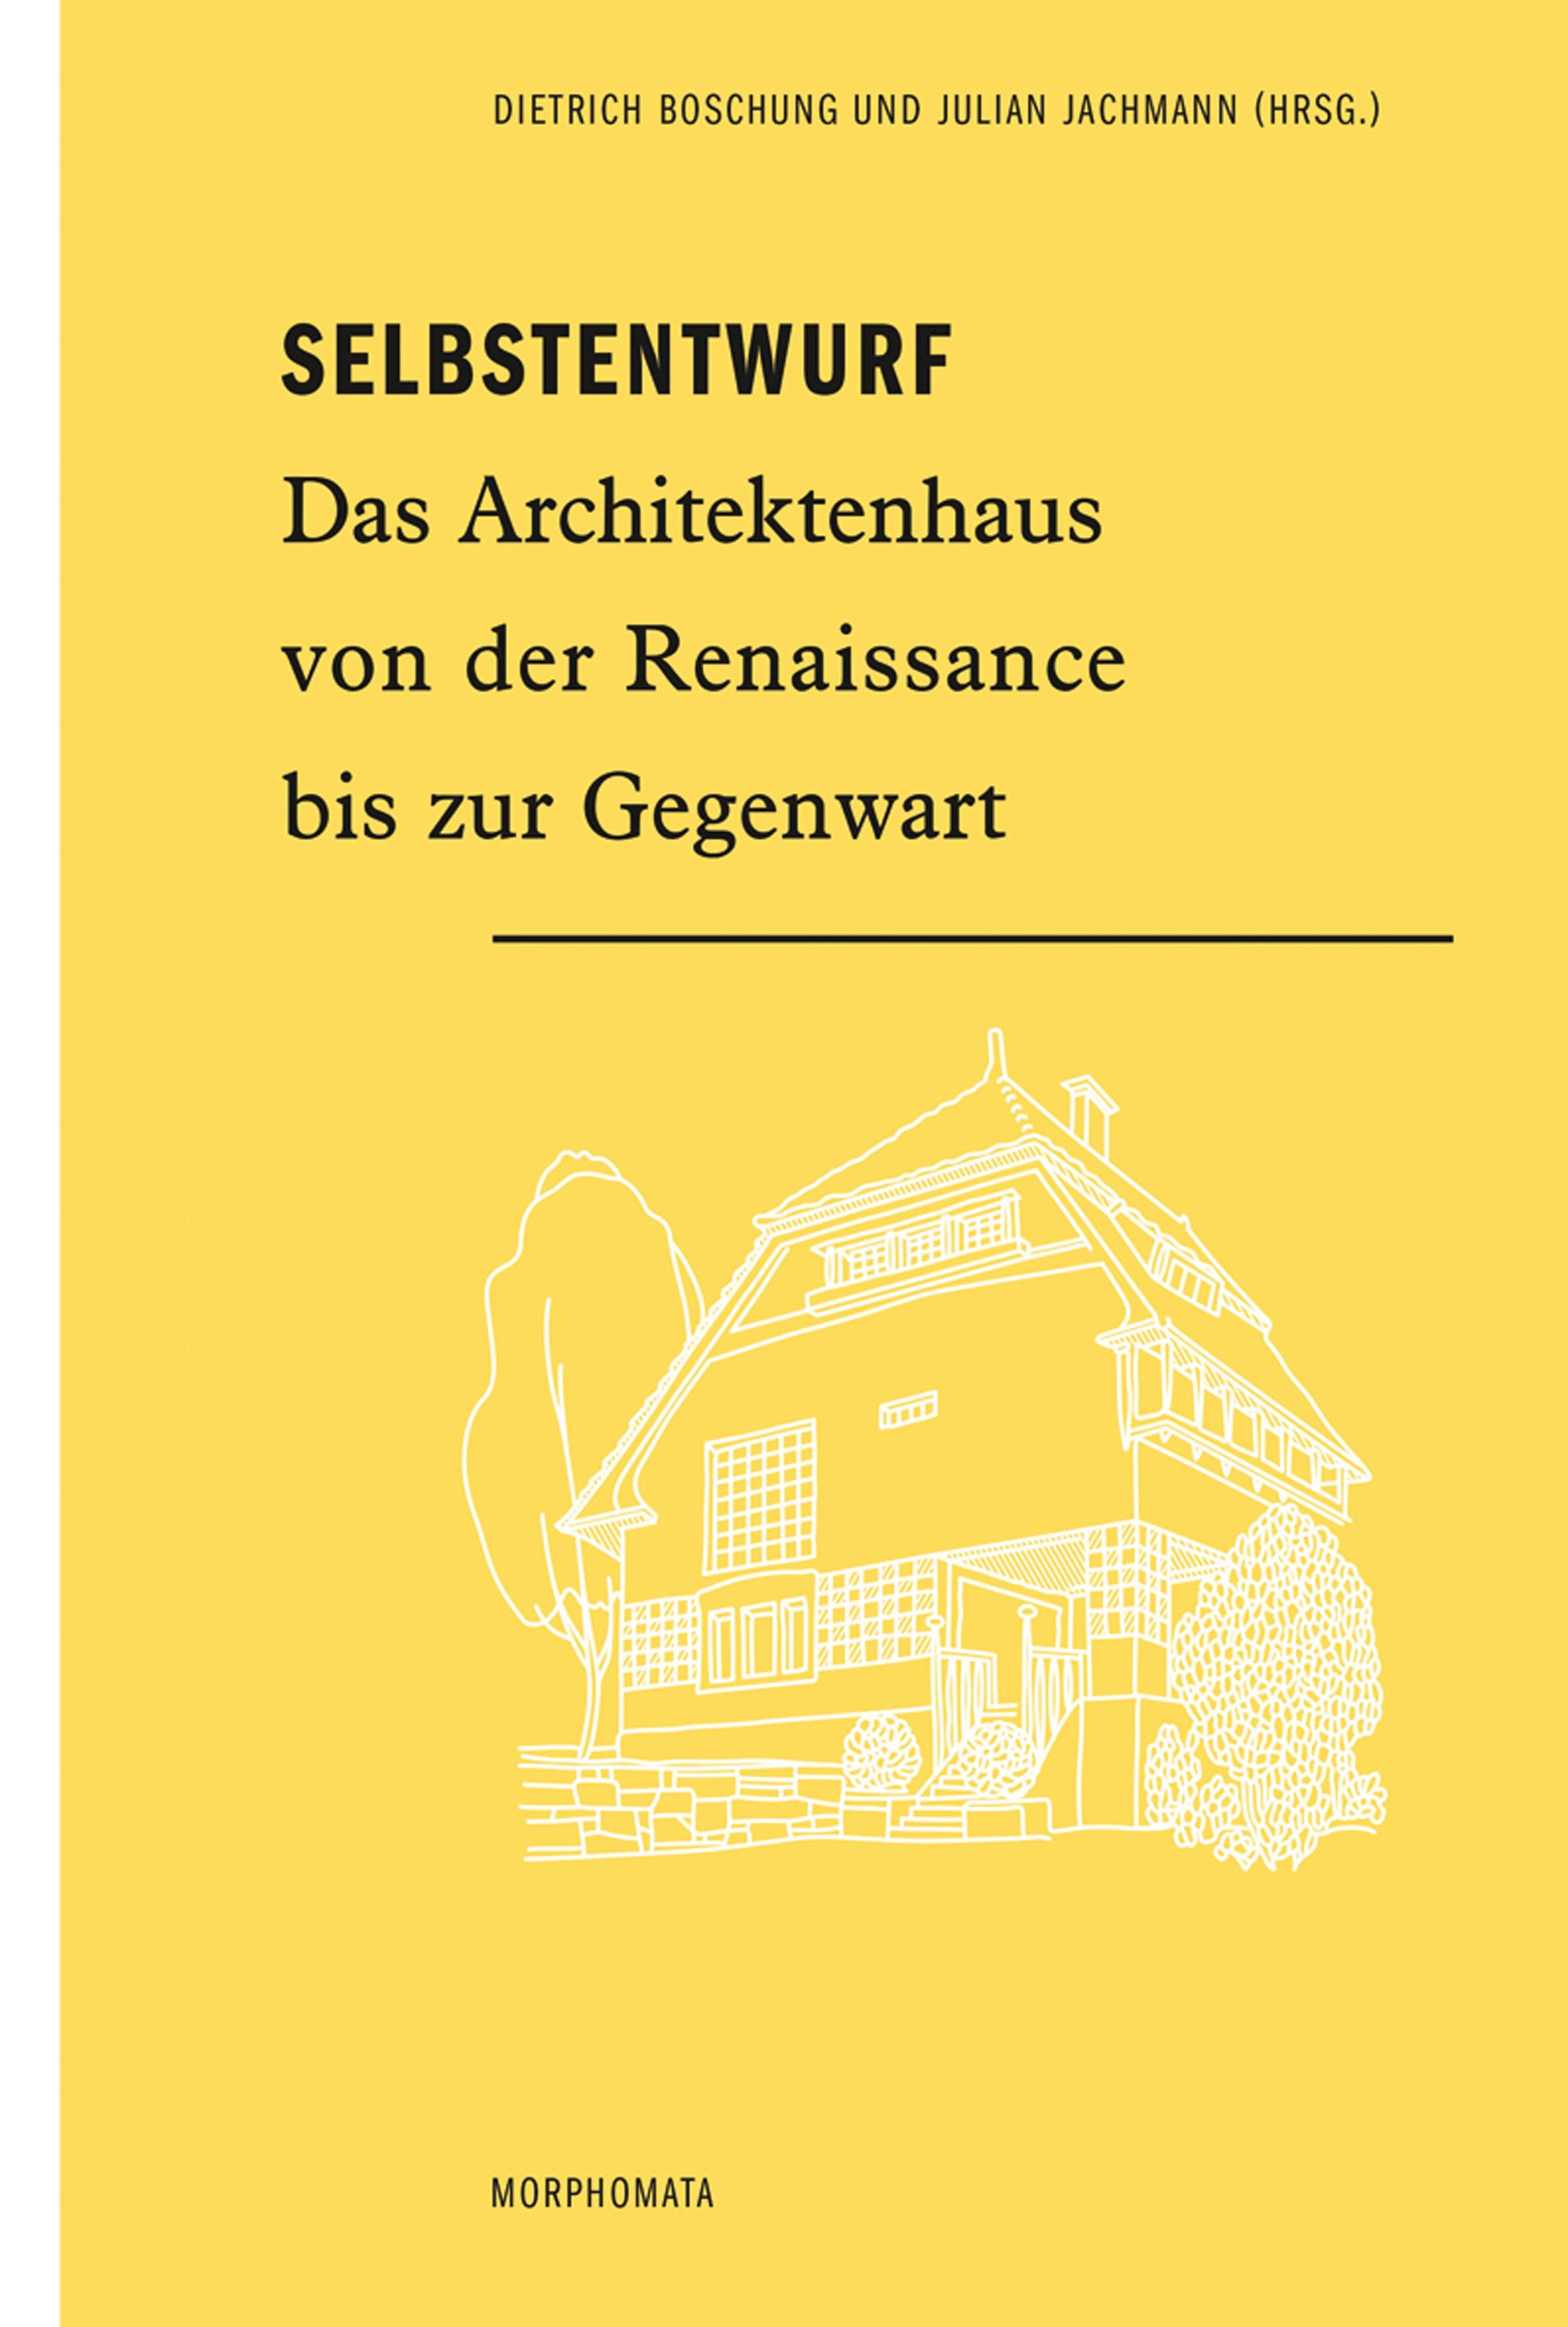 Selbstentwurf | Boschung / Jachmann, 2018 | Buch (Cover)